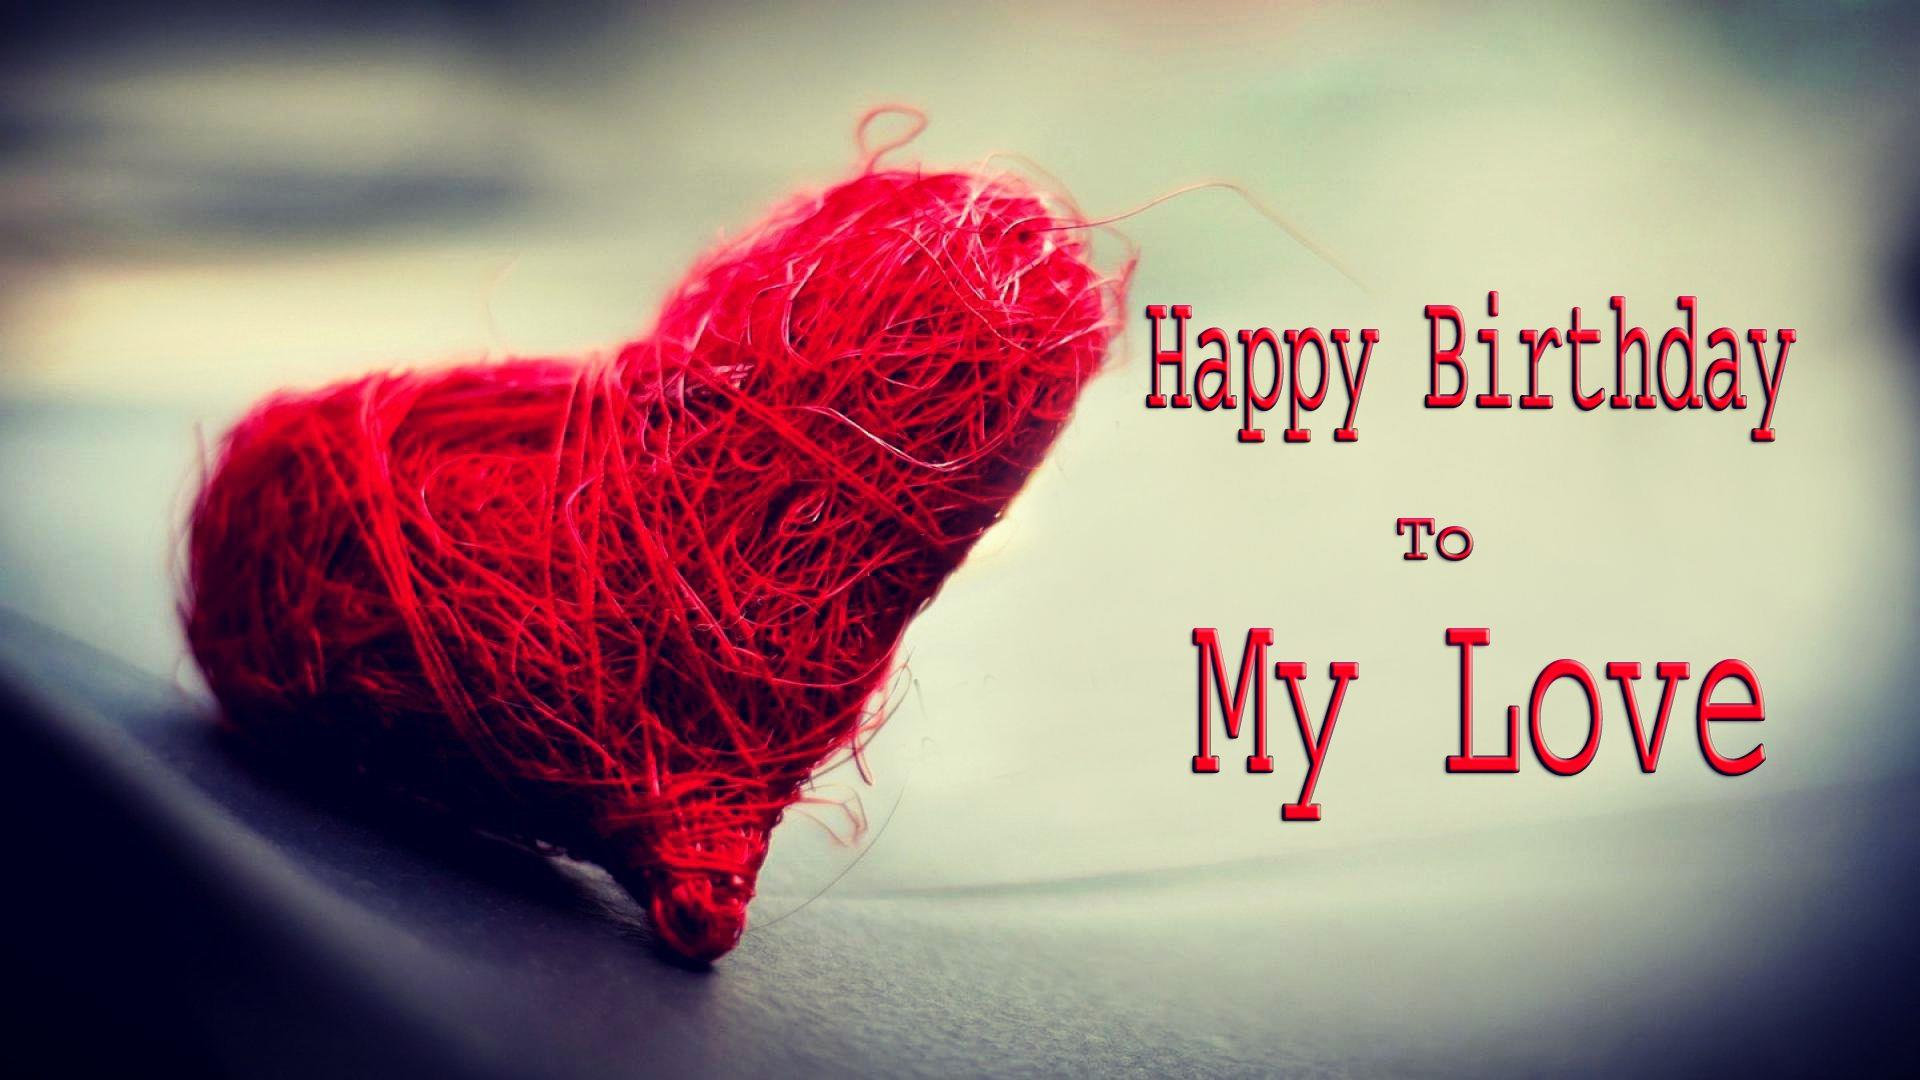 Happy Birthday To My Love Couple Birthday Wishes